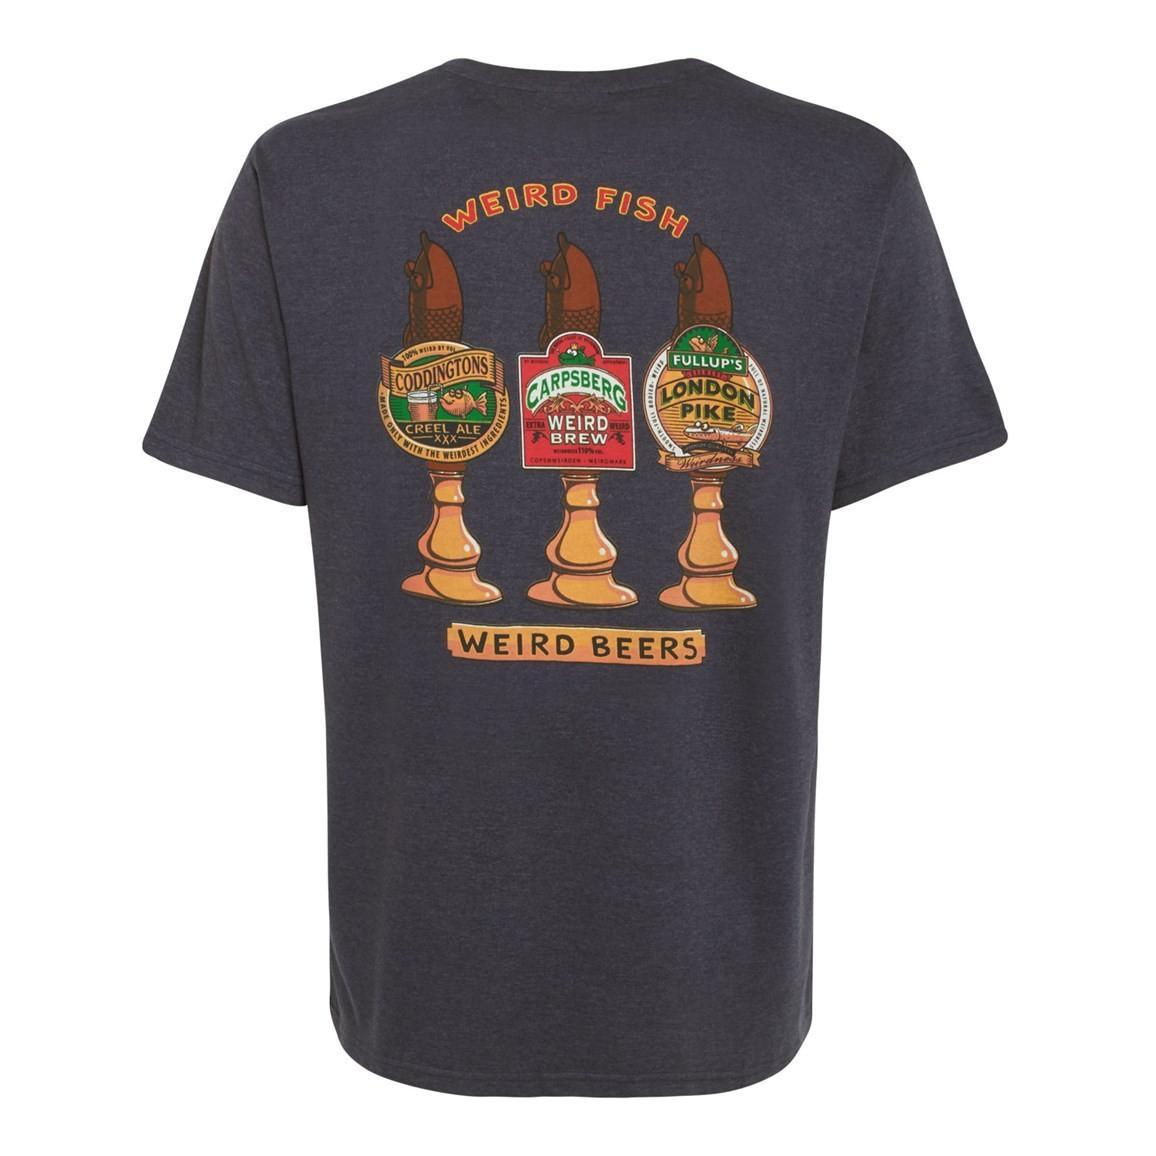 Weird Beers Printed Artist T-Shirt Ebony Marl